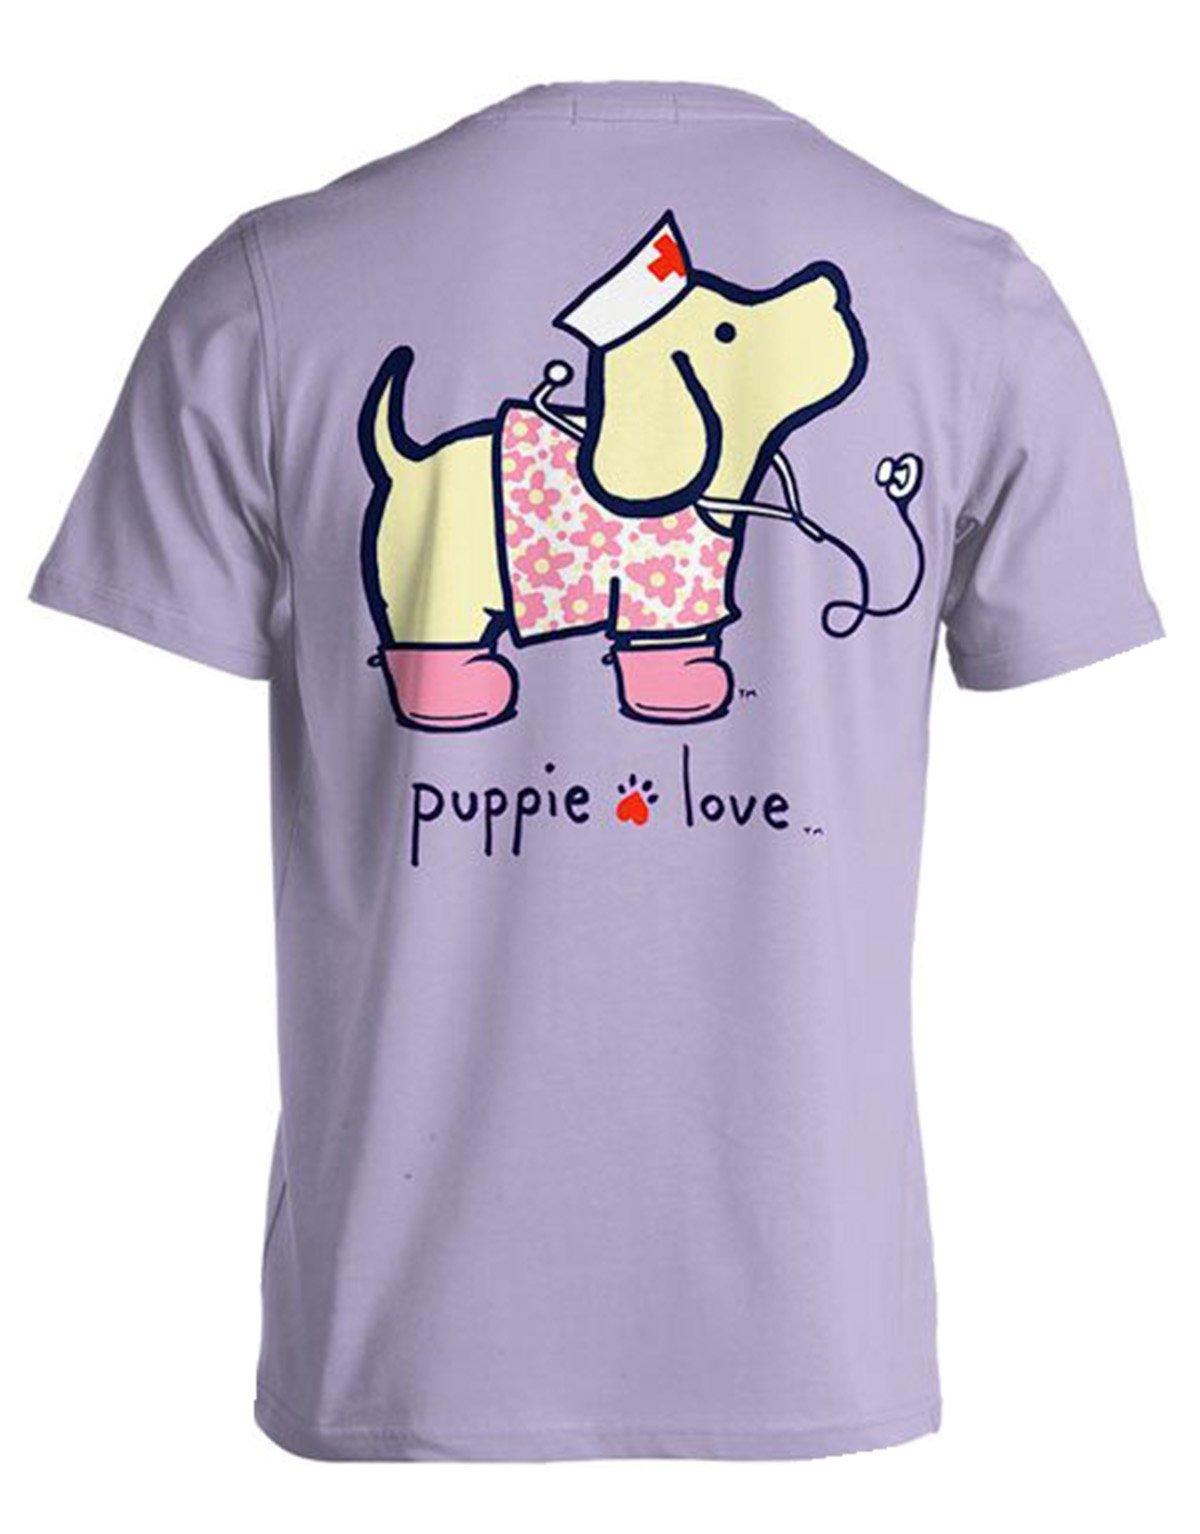 Puppie Love Nightingale Nurse Pup Help Rescue Dogs T-shirt-xl